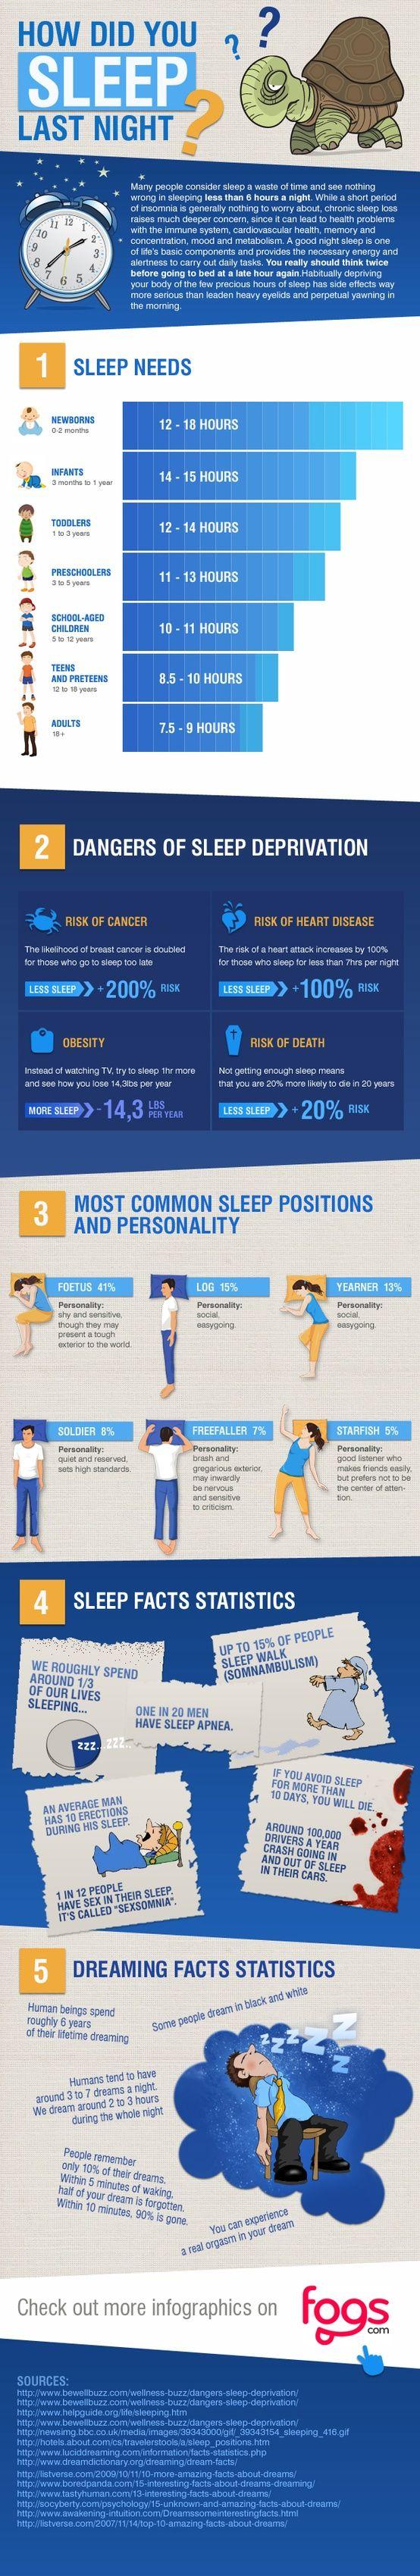 Sleep Infographic | REPINNED